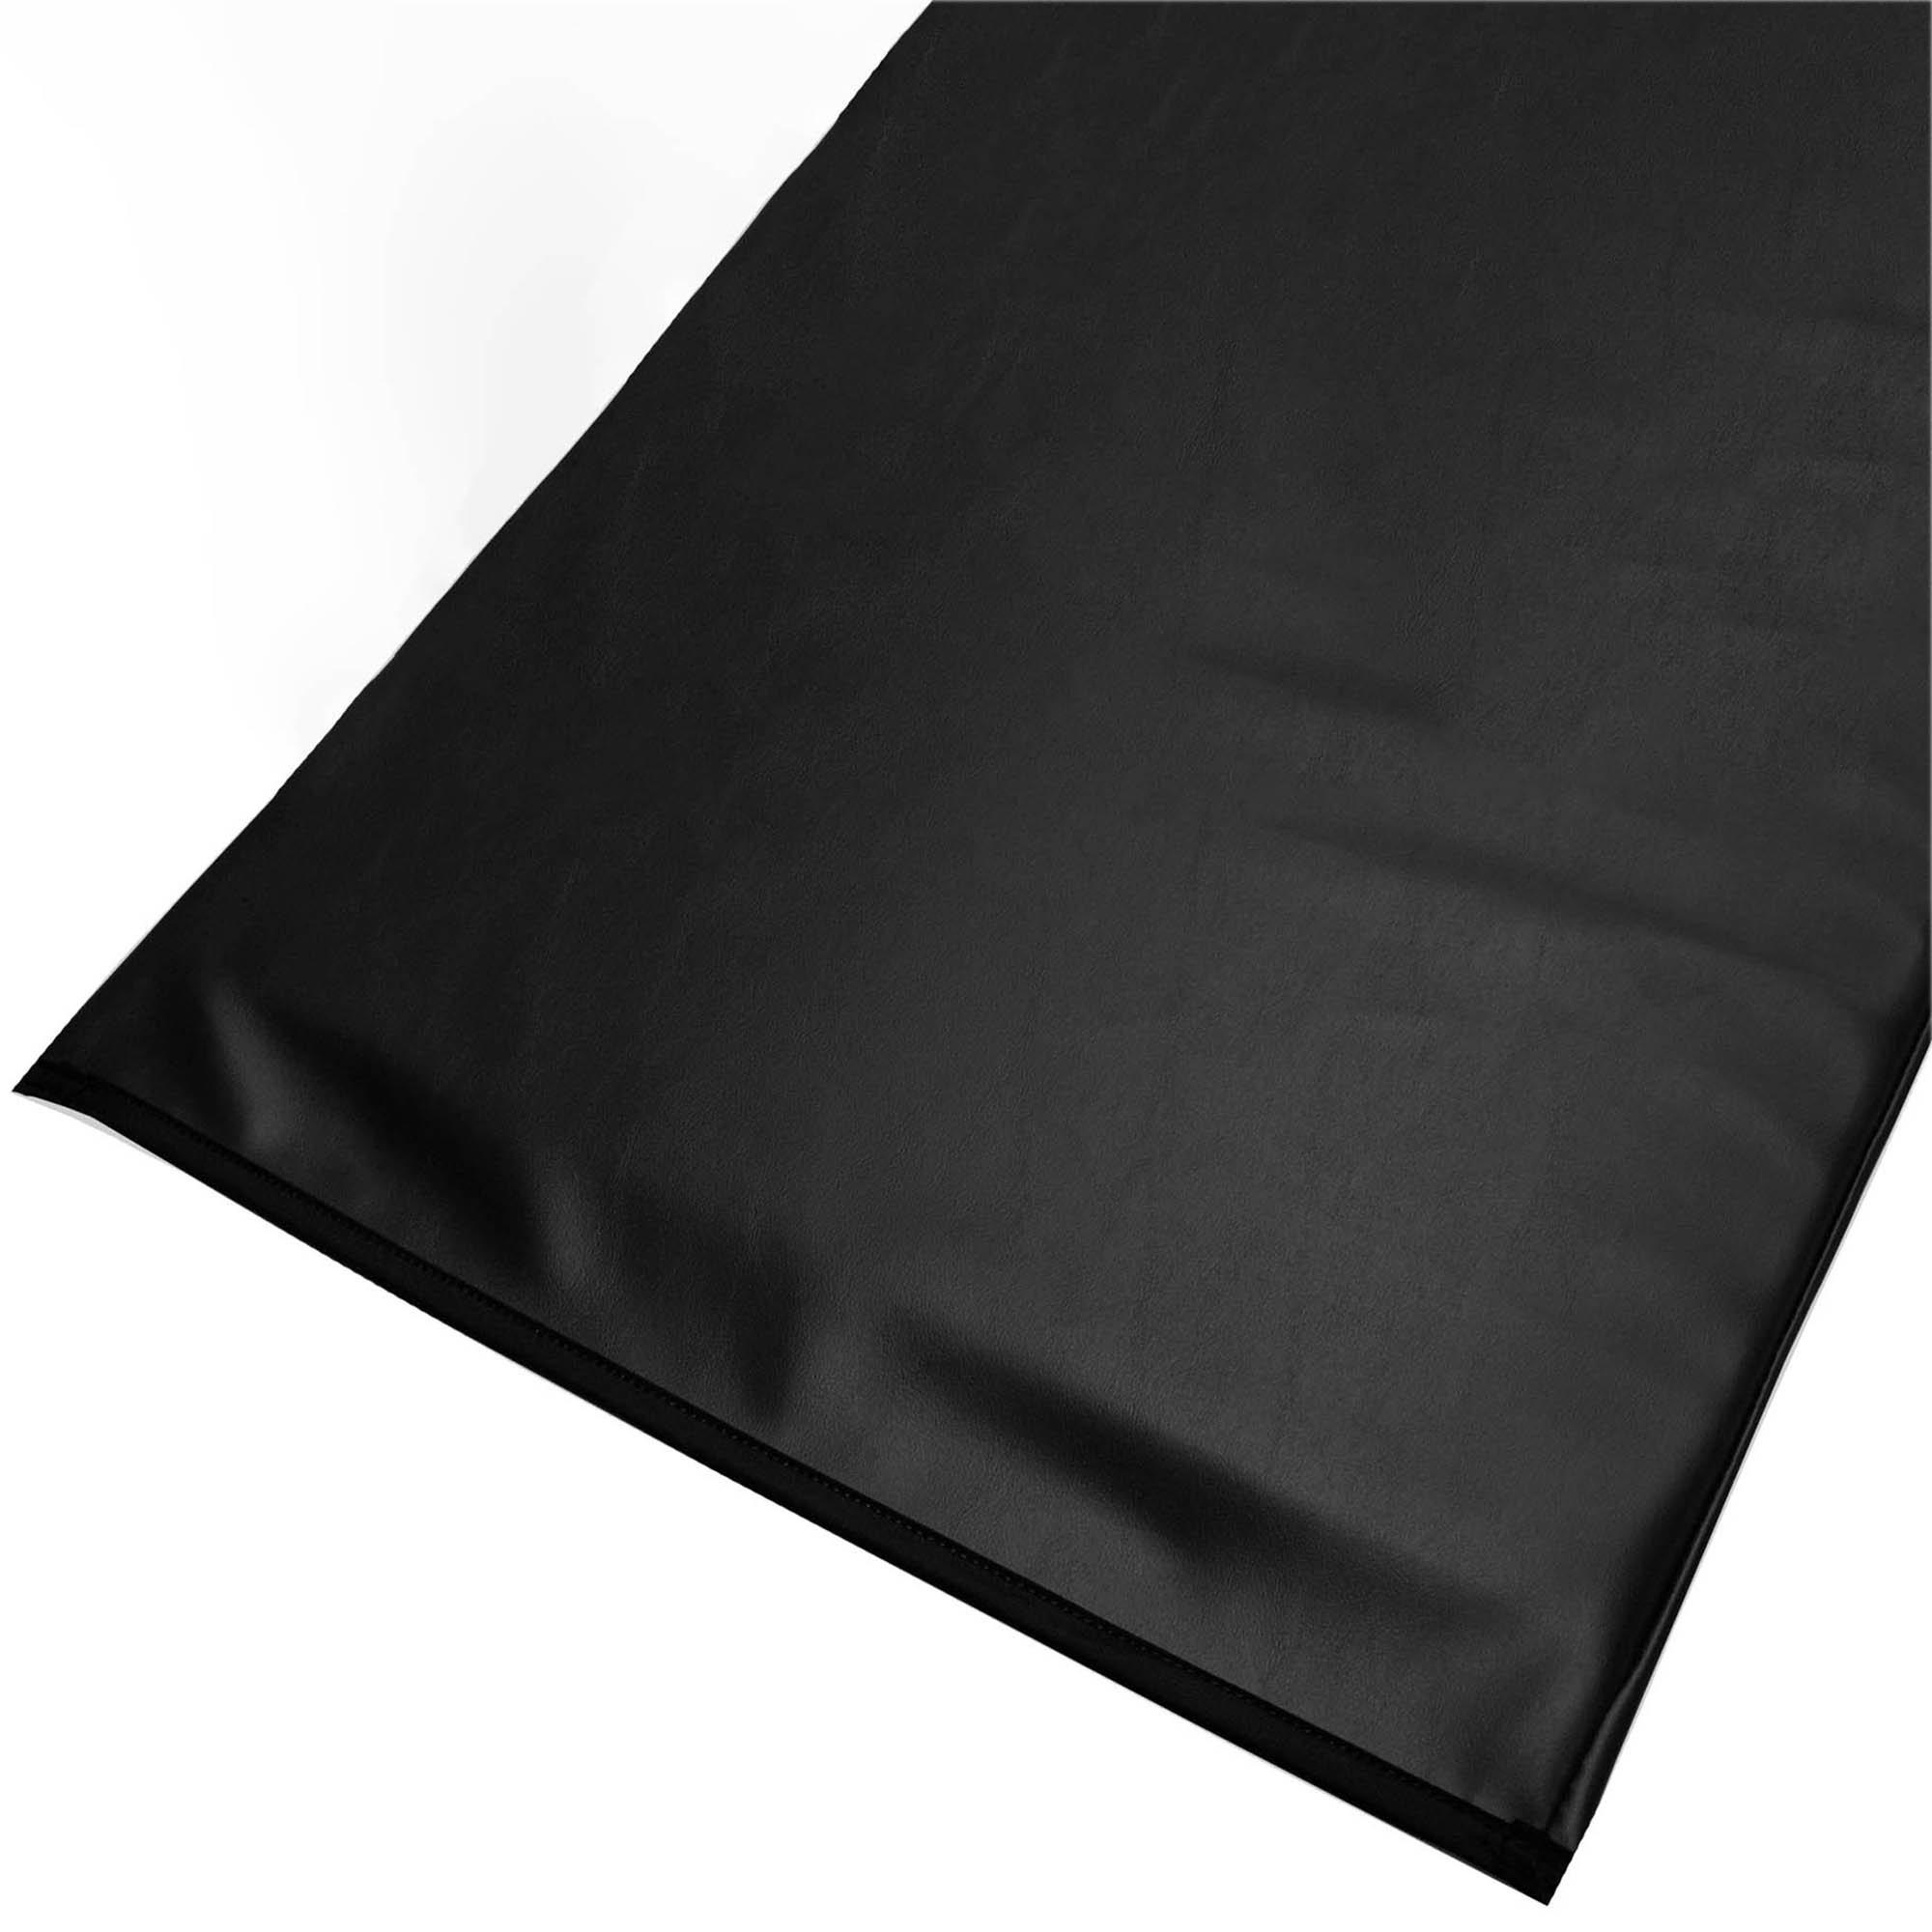 Standard Plus Radiolucent X-Ray Firm Foam Table Pad - Black Vinyl, No Grommets 80